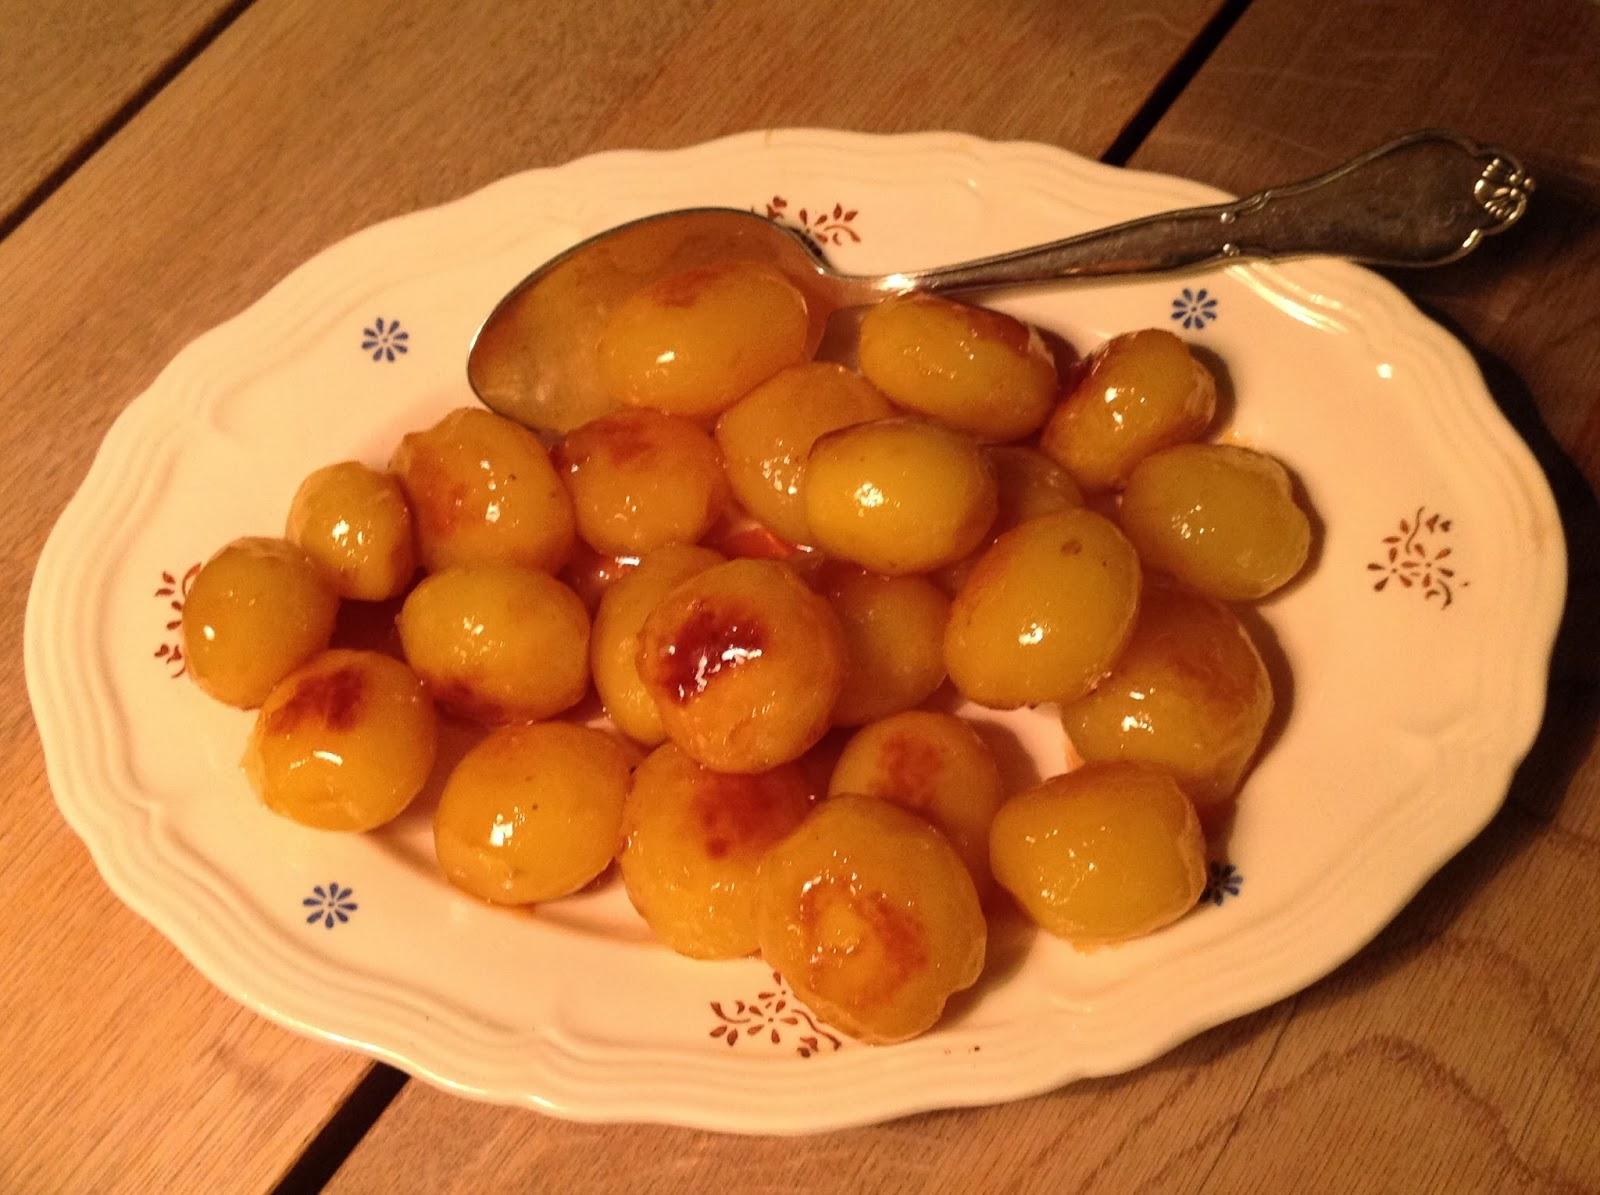 Evas Køkken Perfekte Sukkerbrunede Kartofler